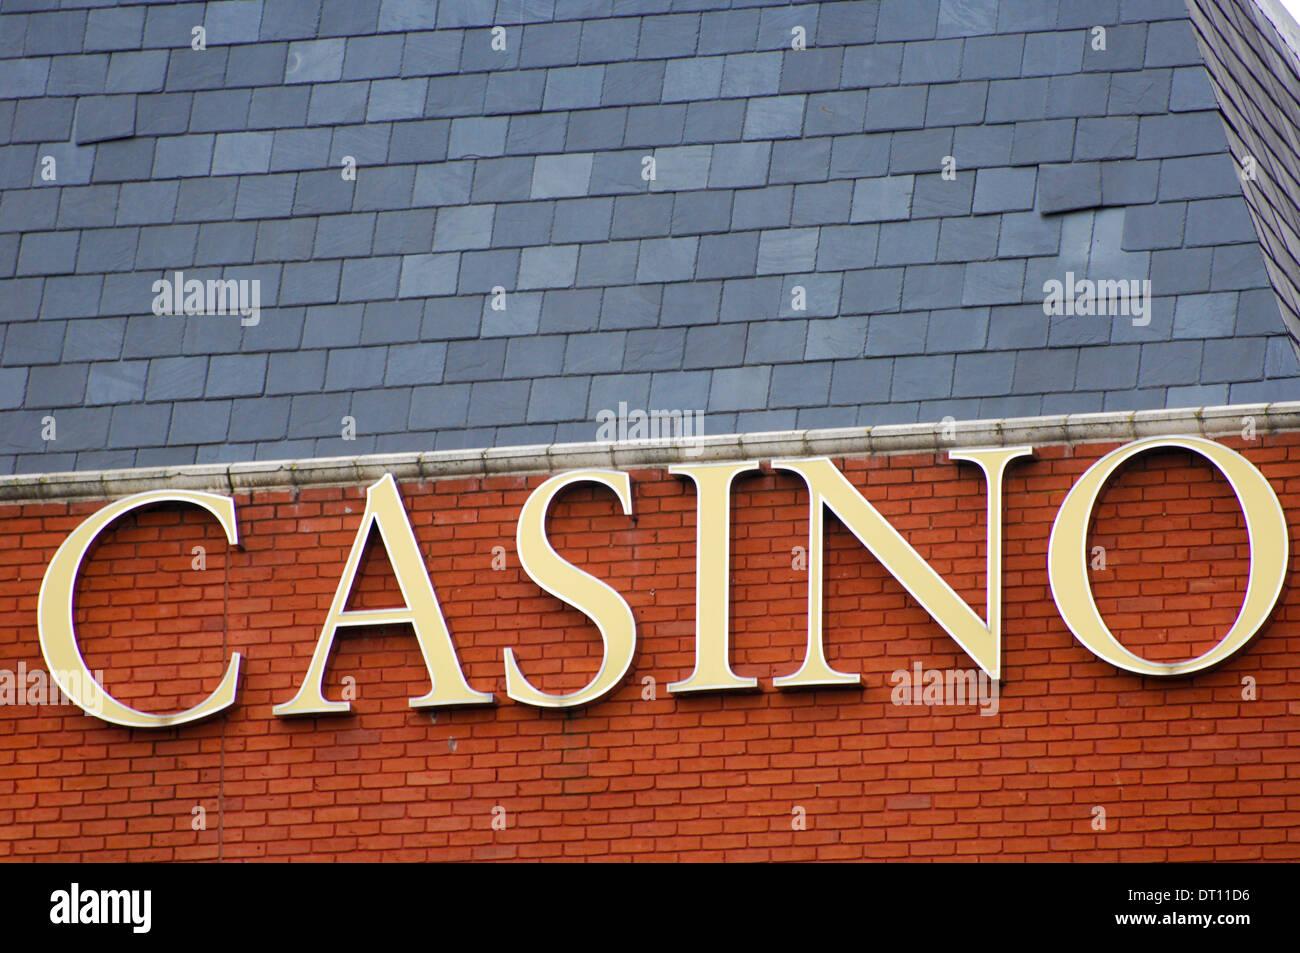 Casino Northampton - Stock Image